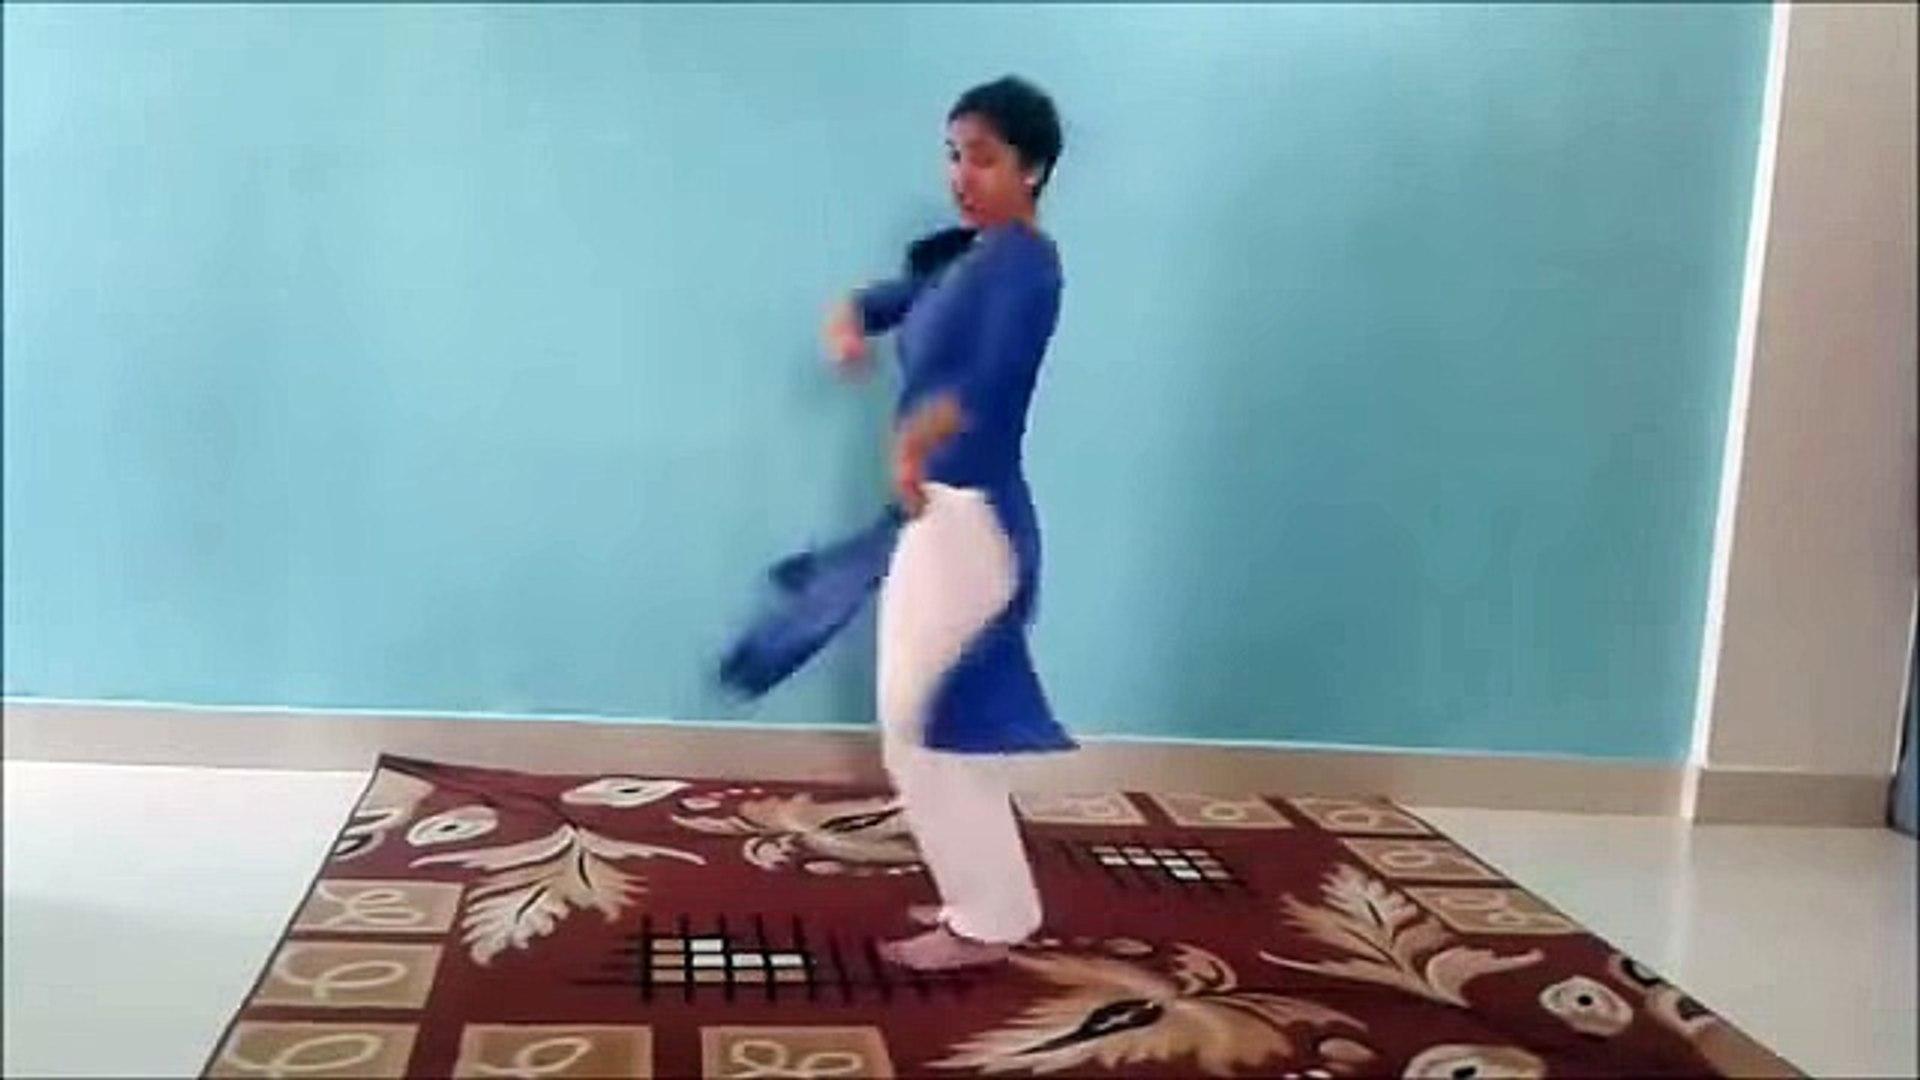 Local haryana dance -  - Sexy Leaked Video PAKISTANI MUJRA DANCE Mujra Videos 2017 Latest Mujra vide